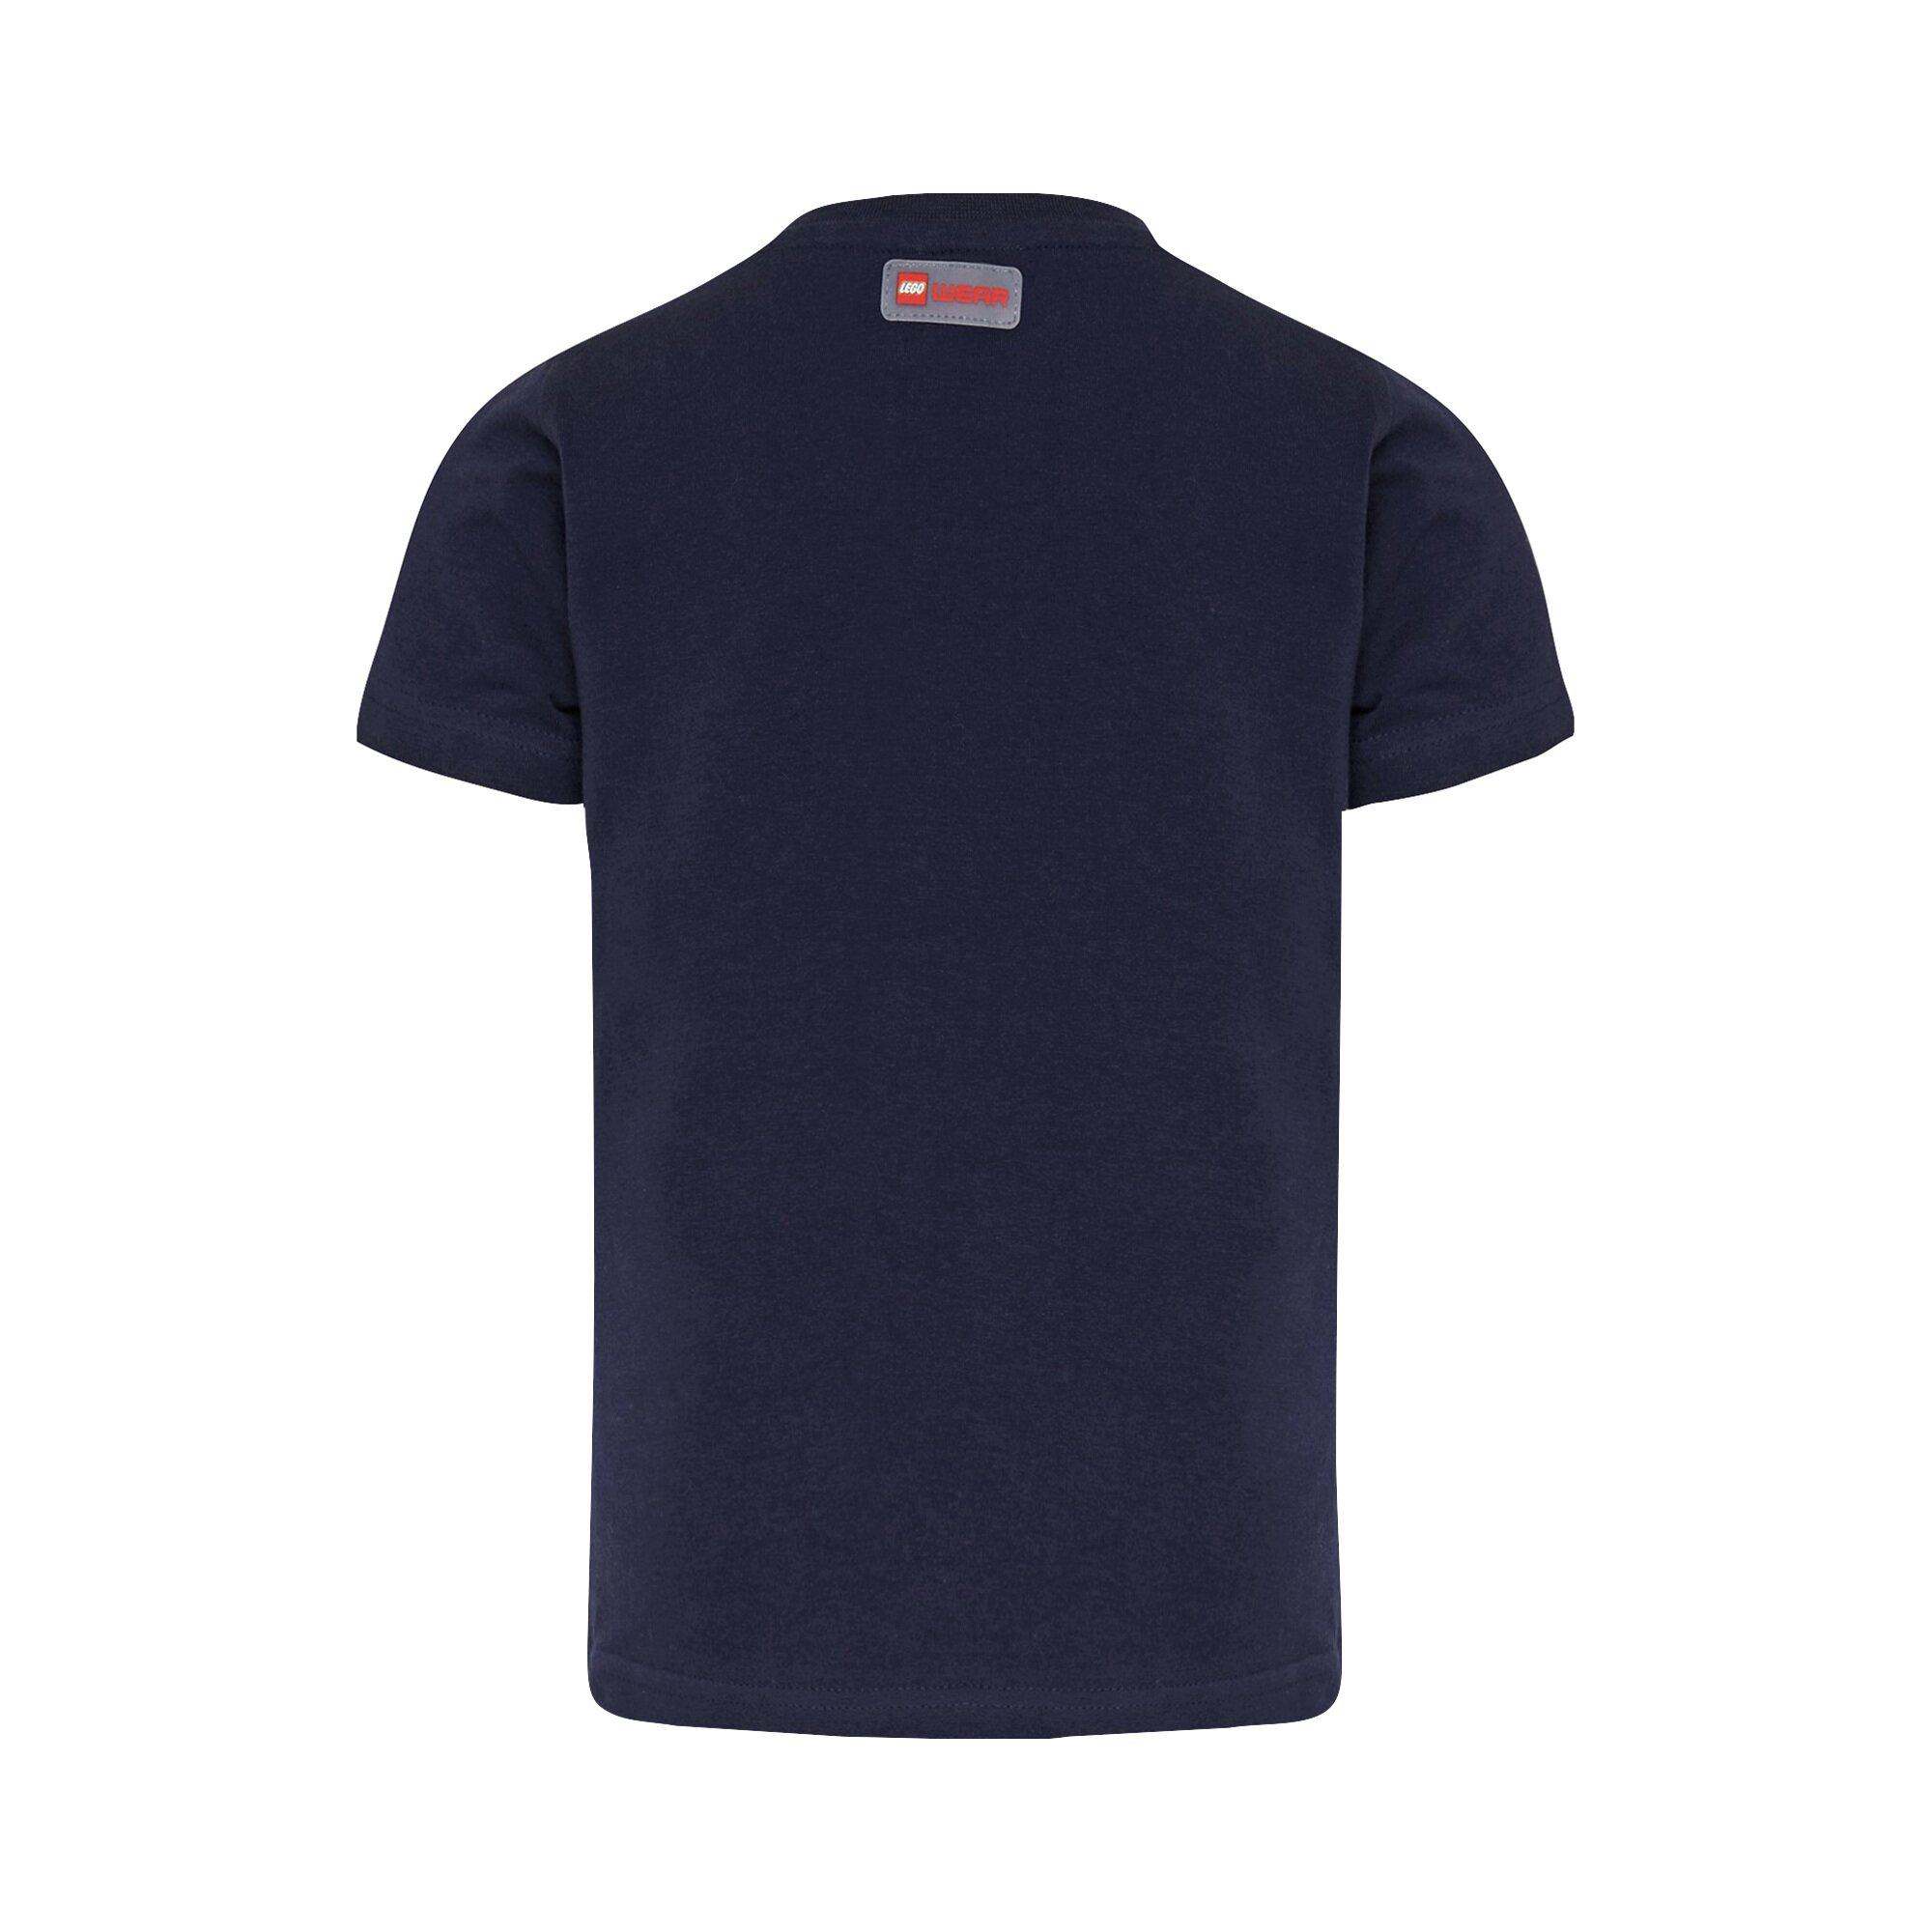 lego-wear-t-shirt-terrence-imagine, 15.95 EUR @ babywalz-de